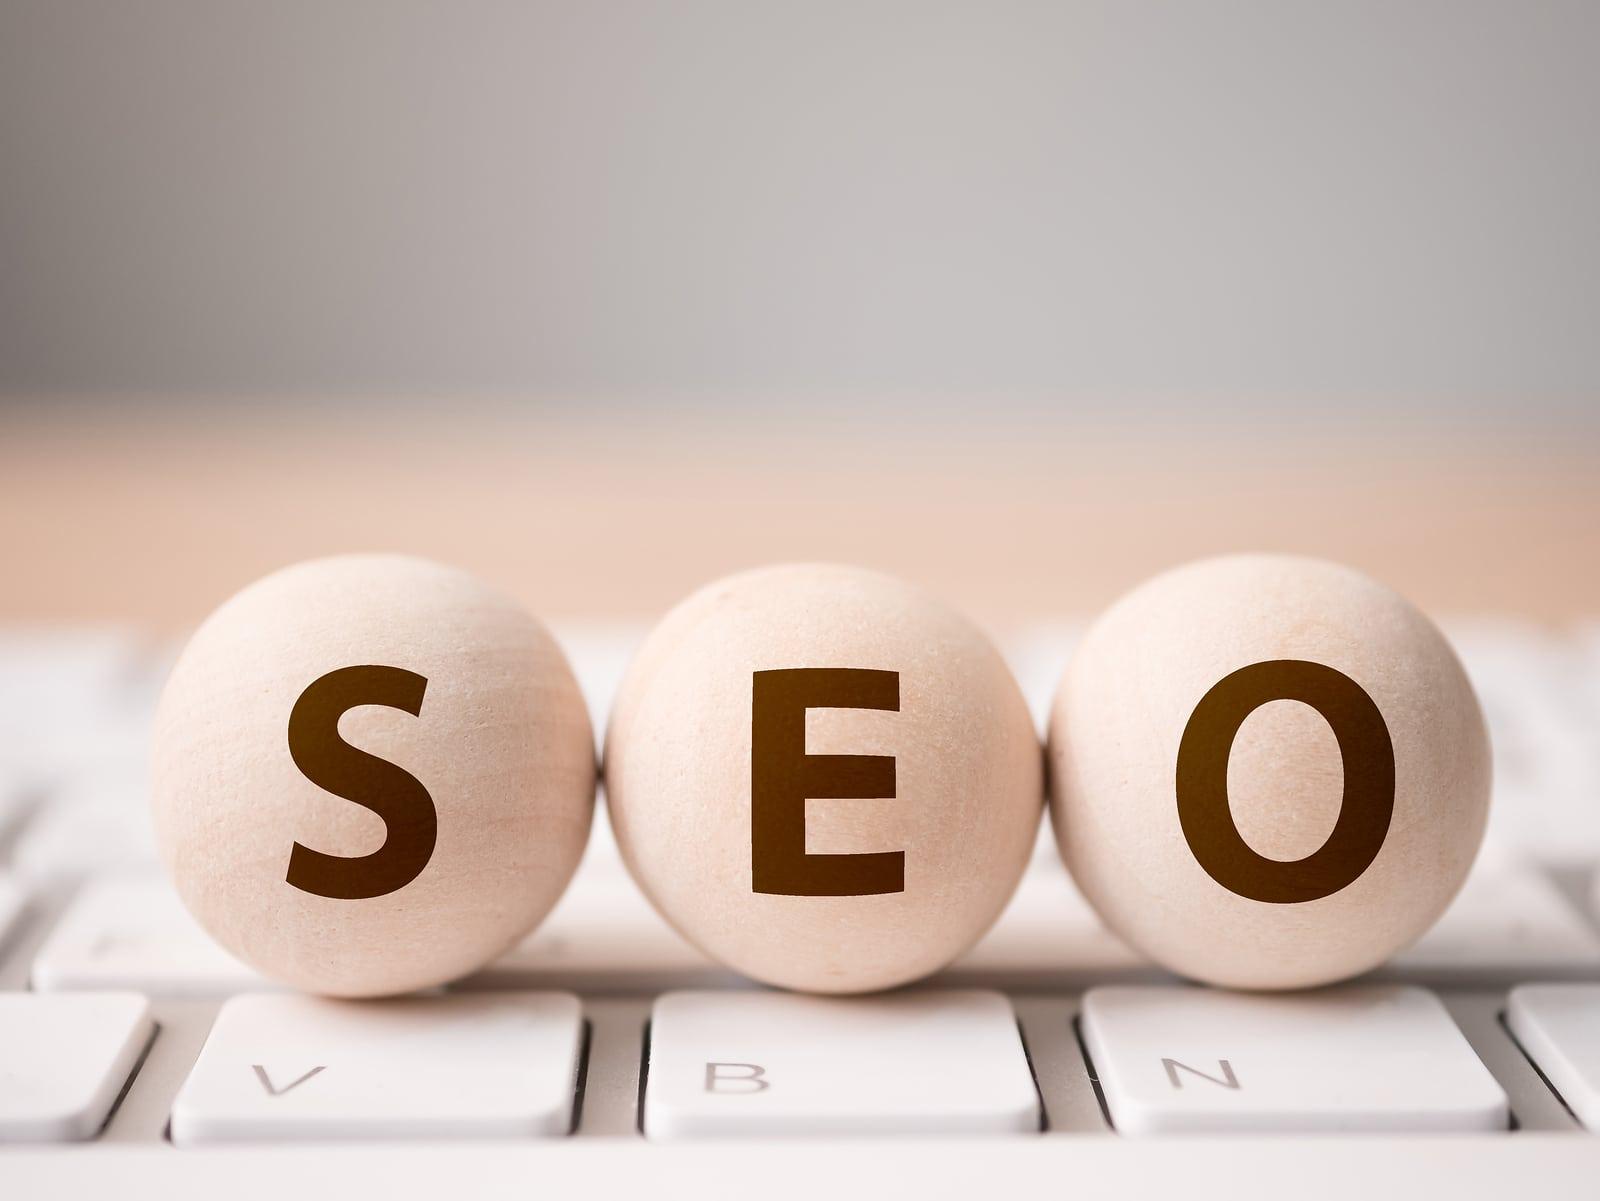 SEO Tactics to Improve Your Website's Rank